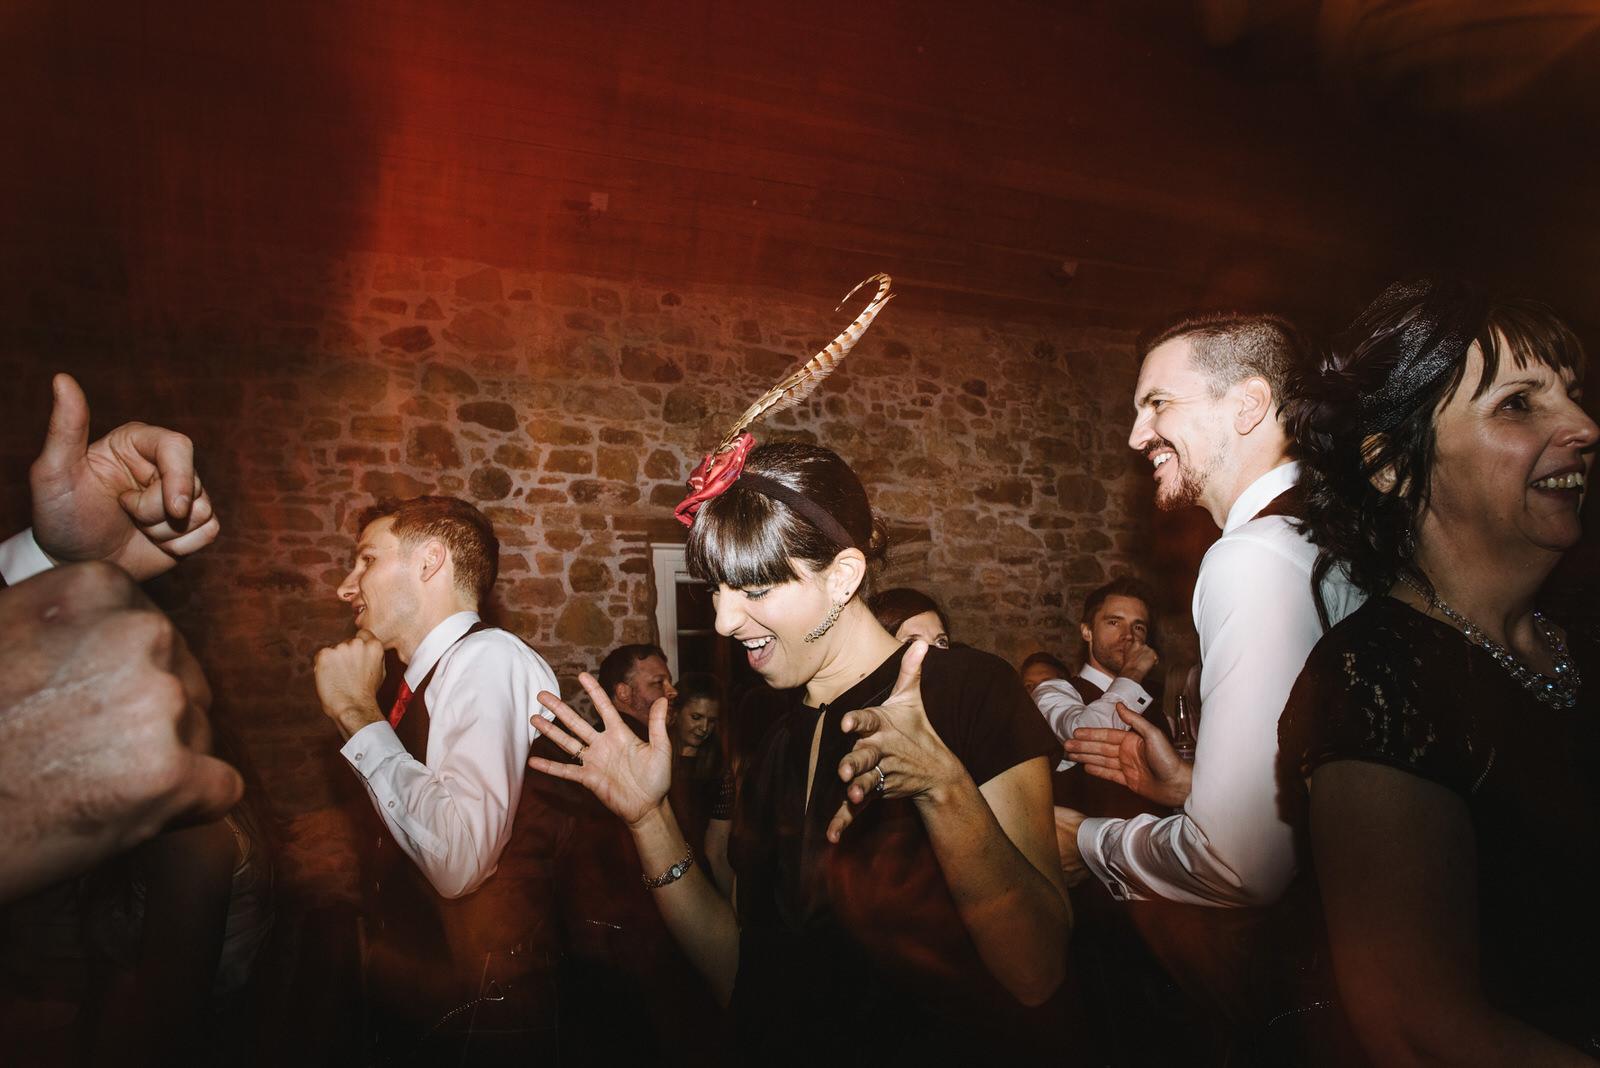 043-COLSTOUN-HOUSE-WEDDING-ALTERNATIVE-WEDDING-PHOTOGRAPHER-GLASGOW-WEDDING-PHOTOGRAPHER-STYLISH-SCOTTISH-WEDDING.JPG